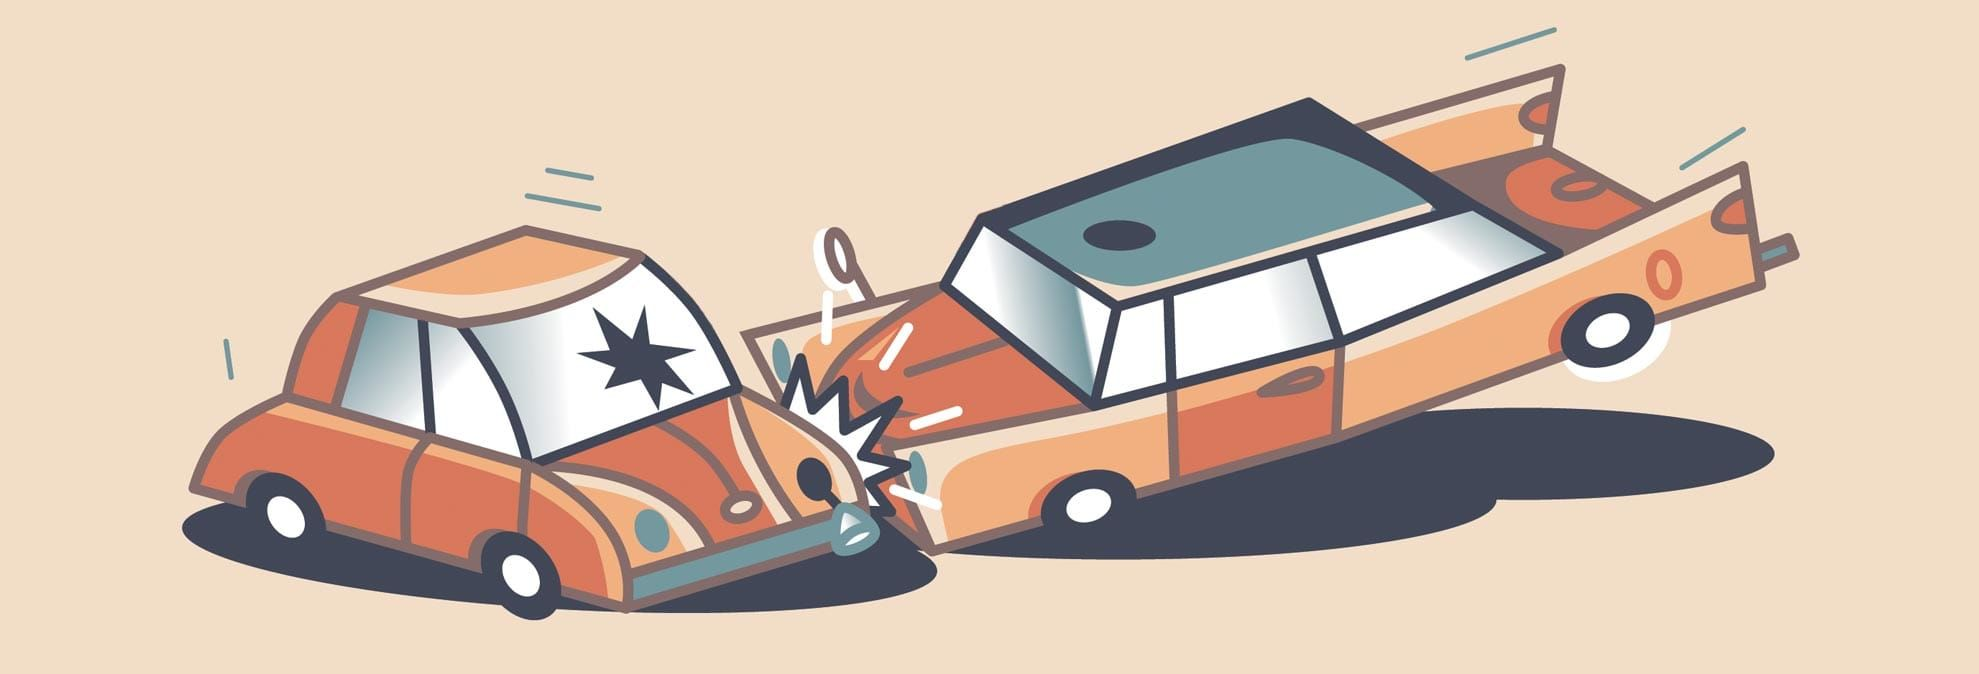 9 Car Insurance Money Savers Surprises With Images Insurance